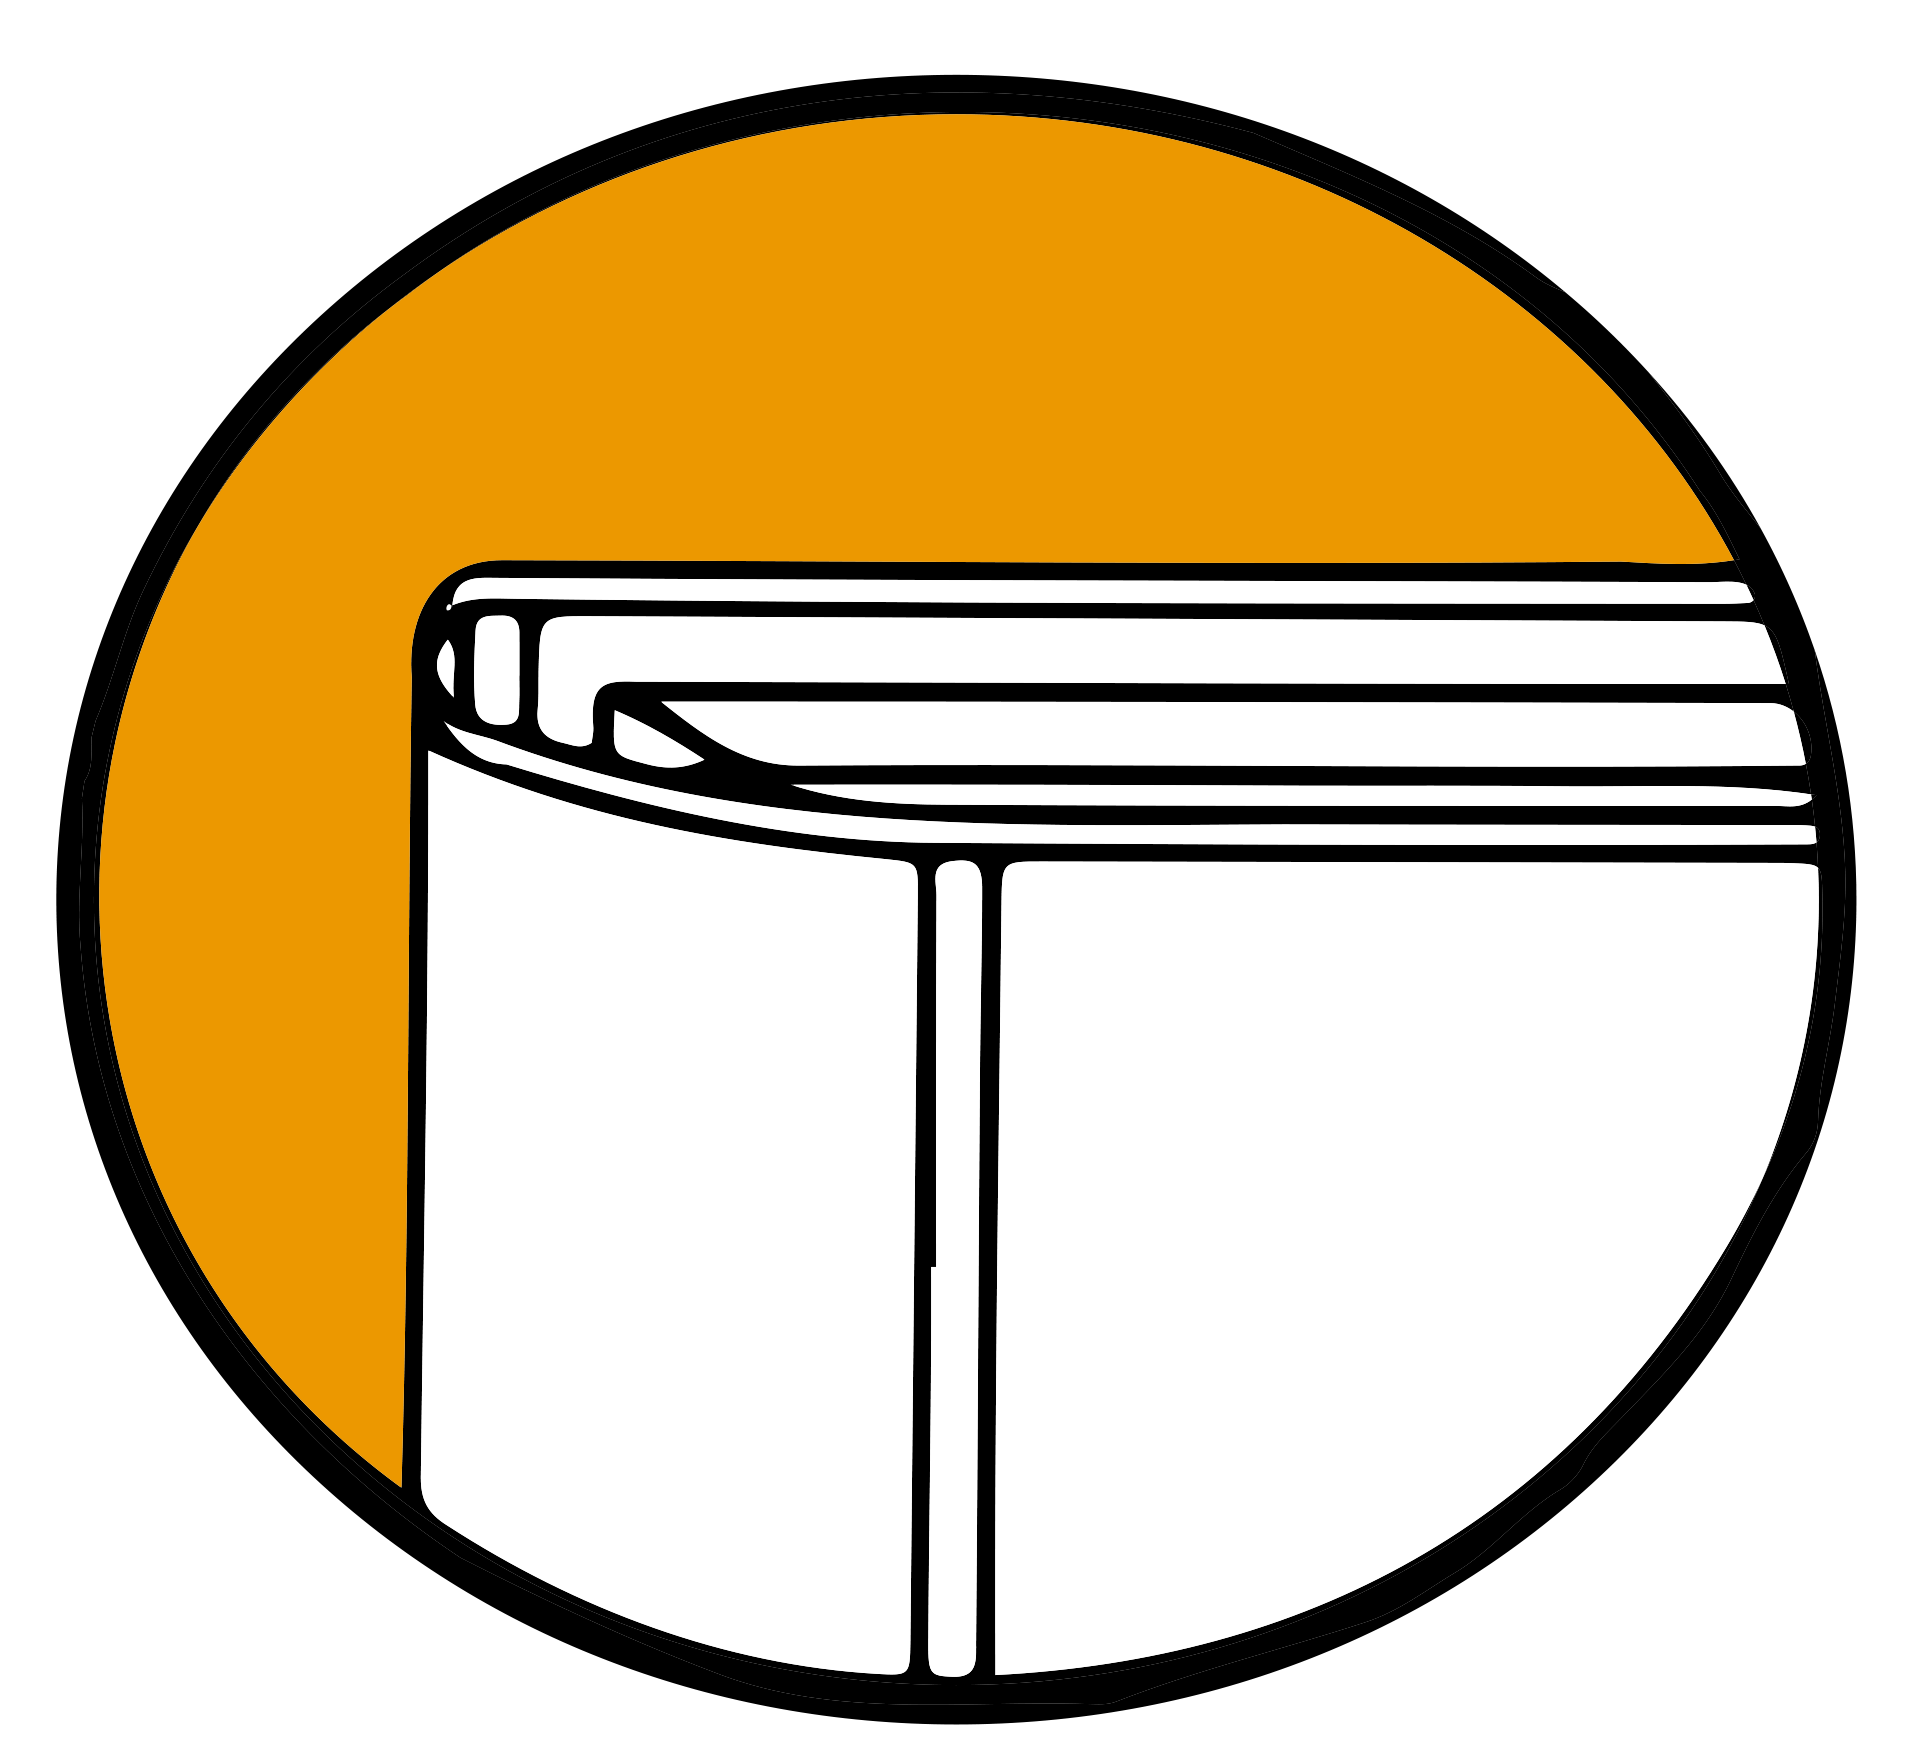 multimedia-packaging-overlap interlockribbed-spineribbed-sidewallssquare-spineroundback-spine